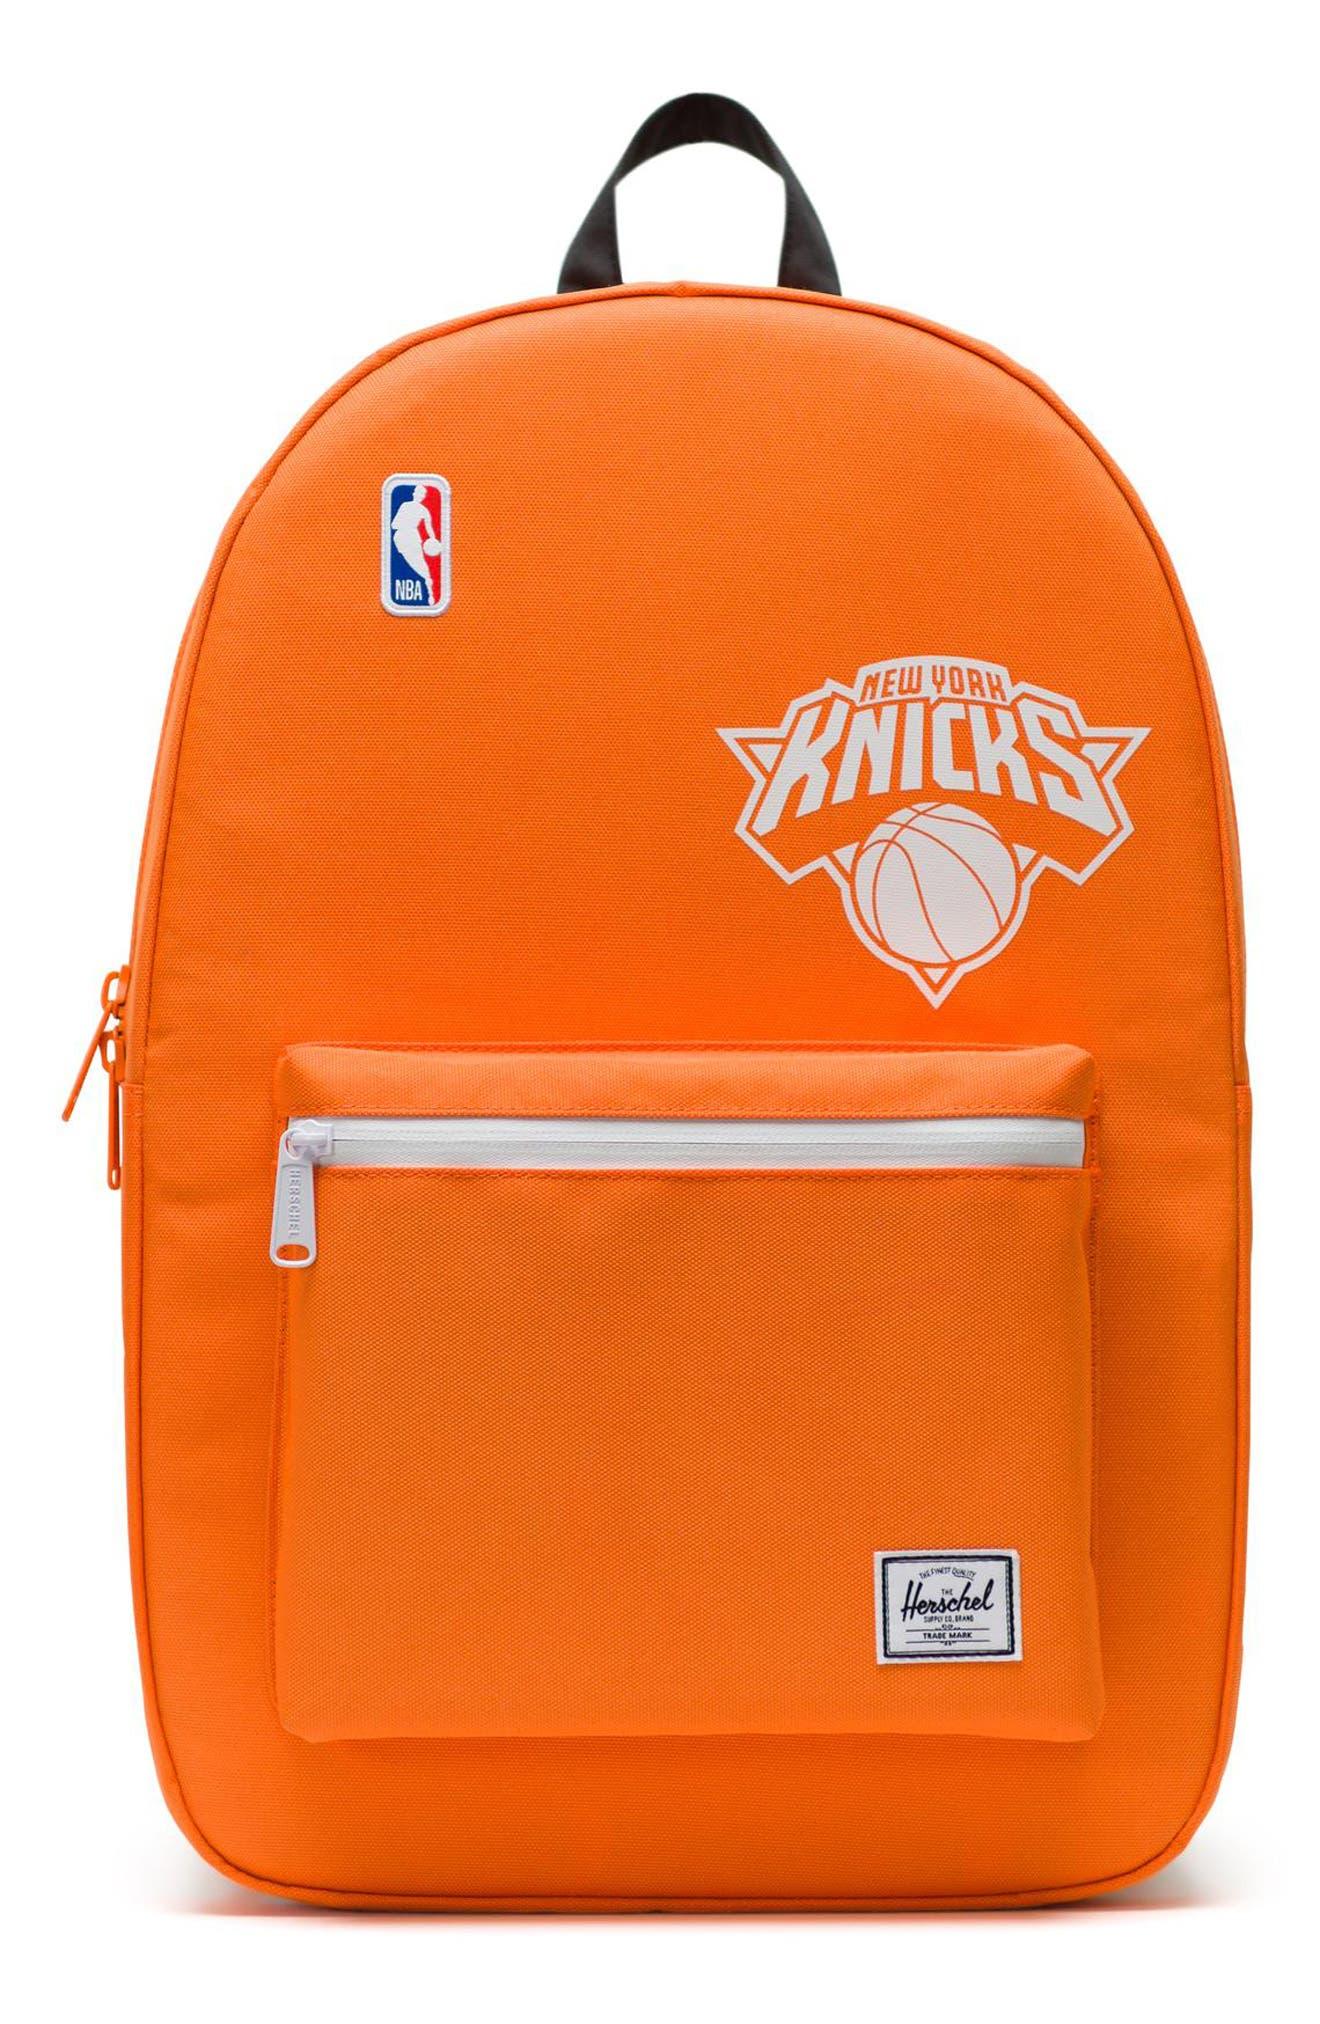 Herschel Supply Co. Settlement Nba Champions 15-Inch Laptop Backpack - Orange